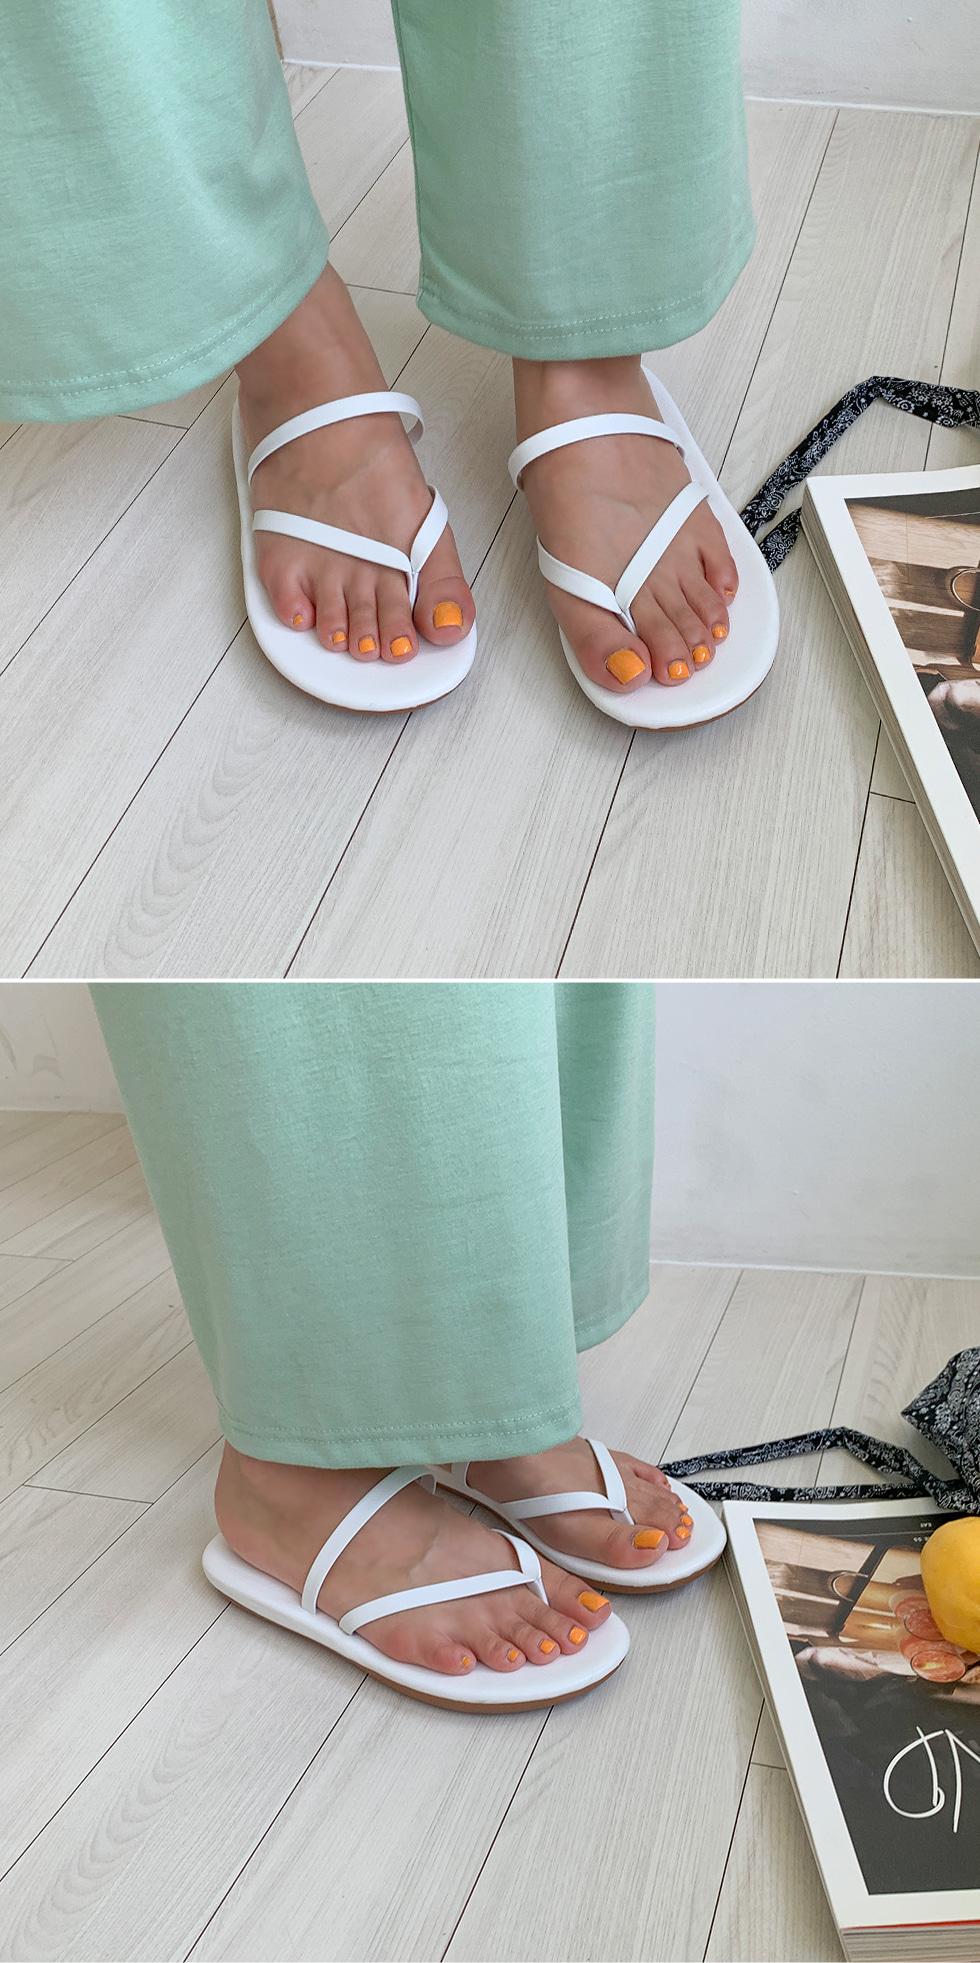 Flip-flop leather